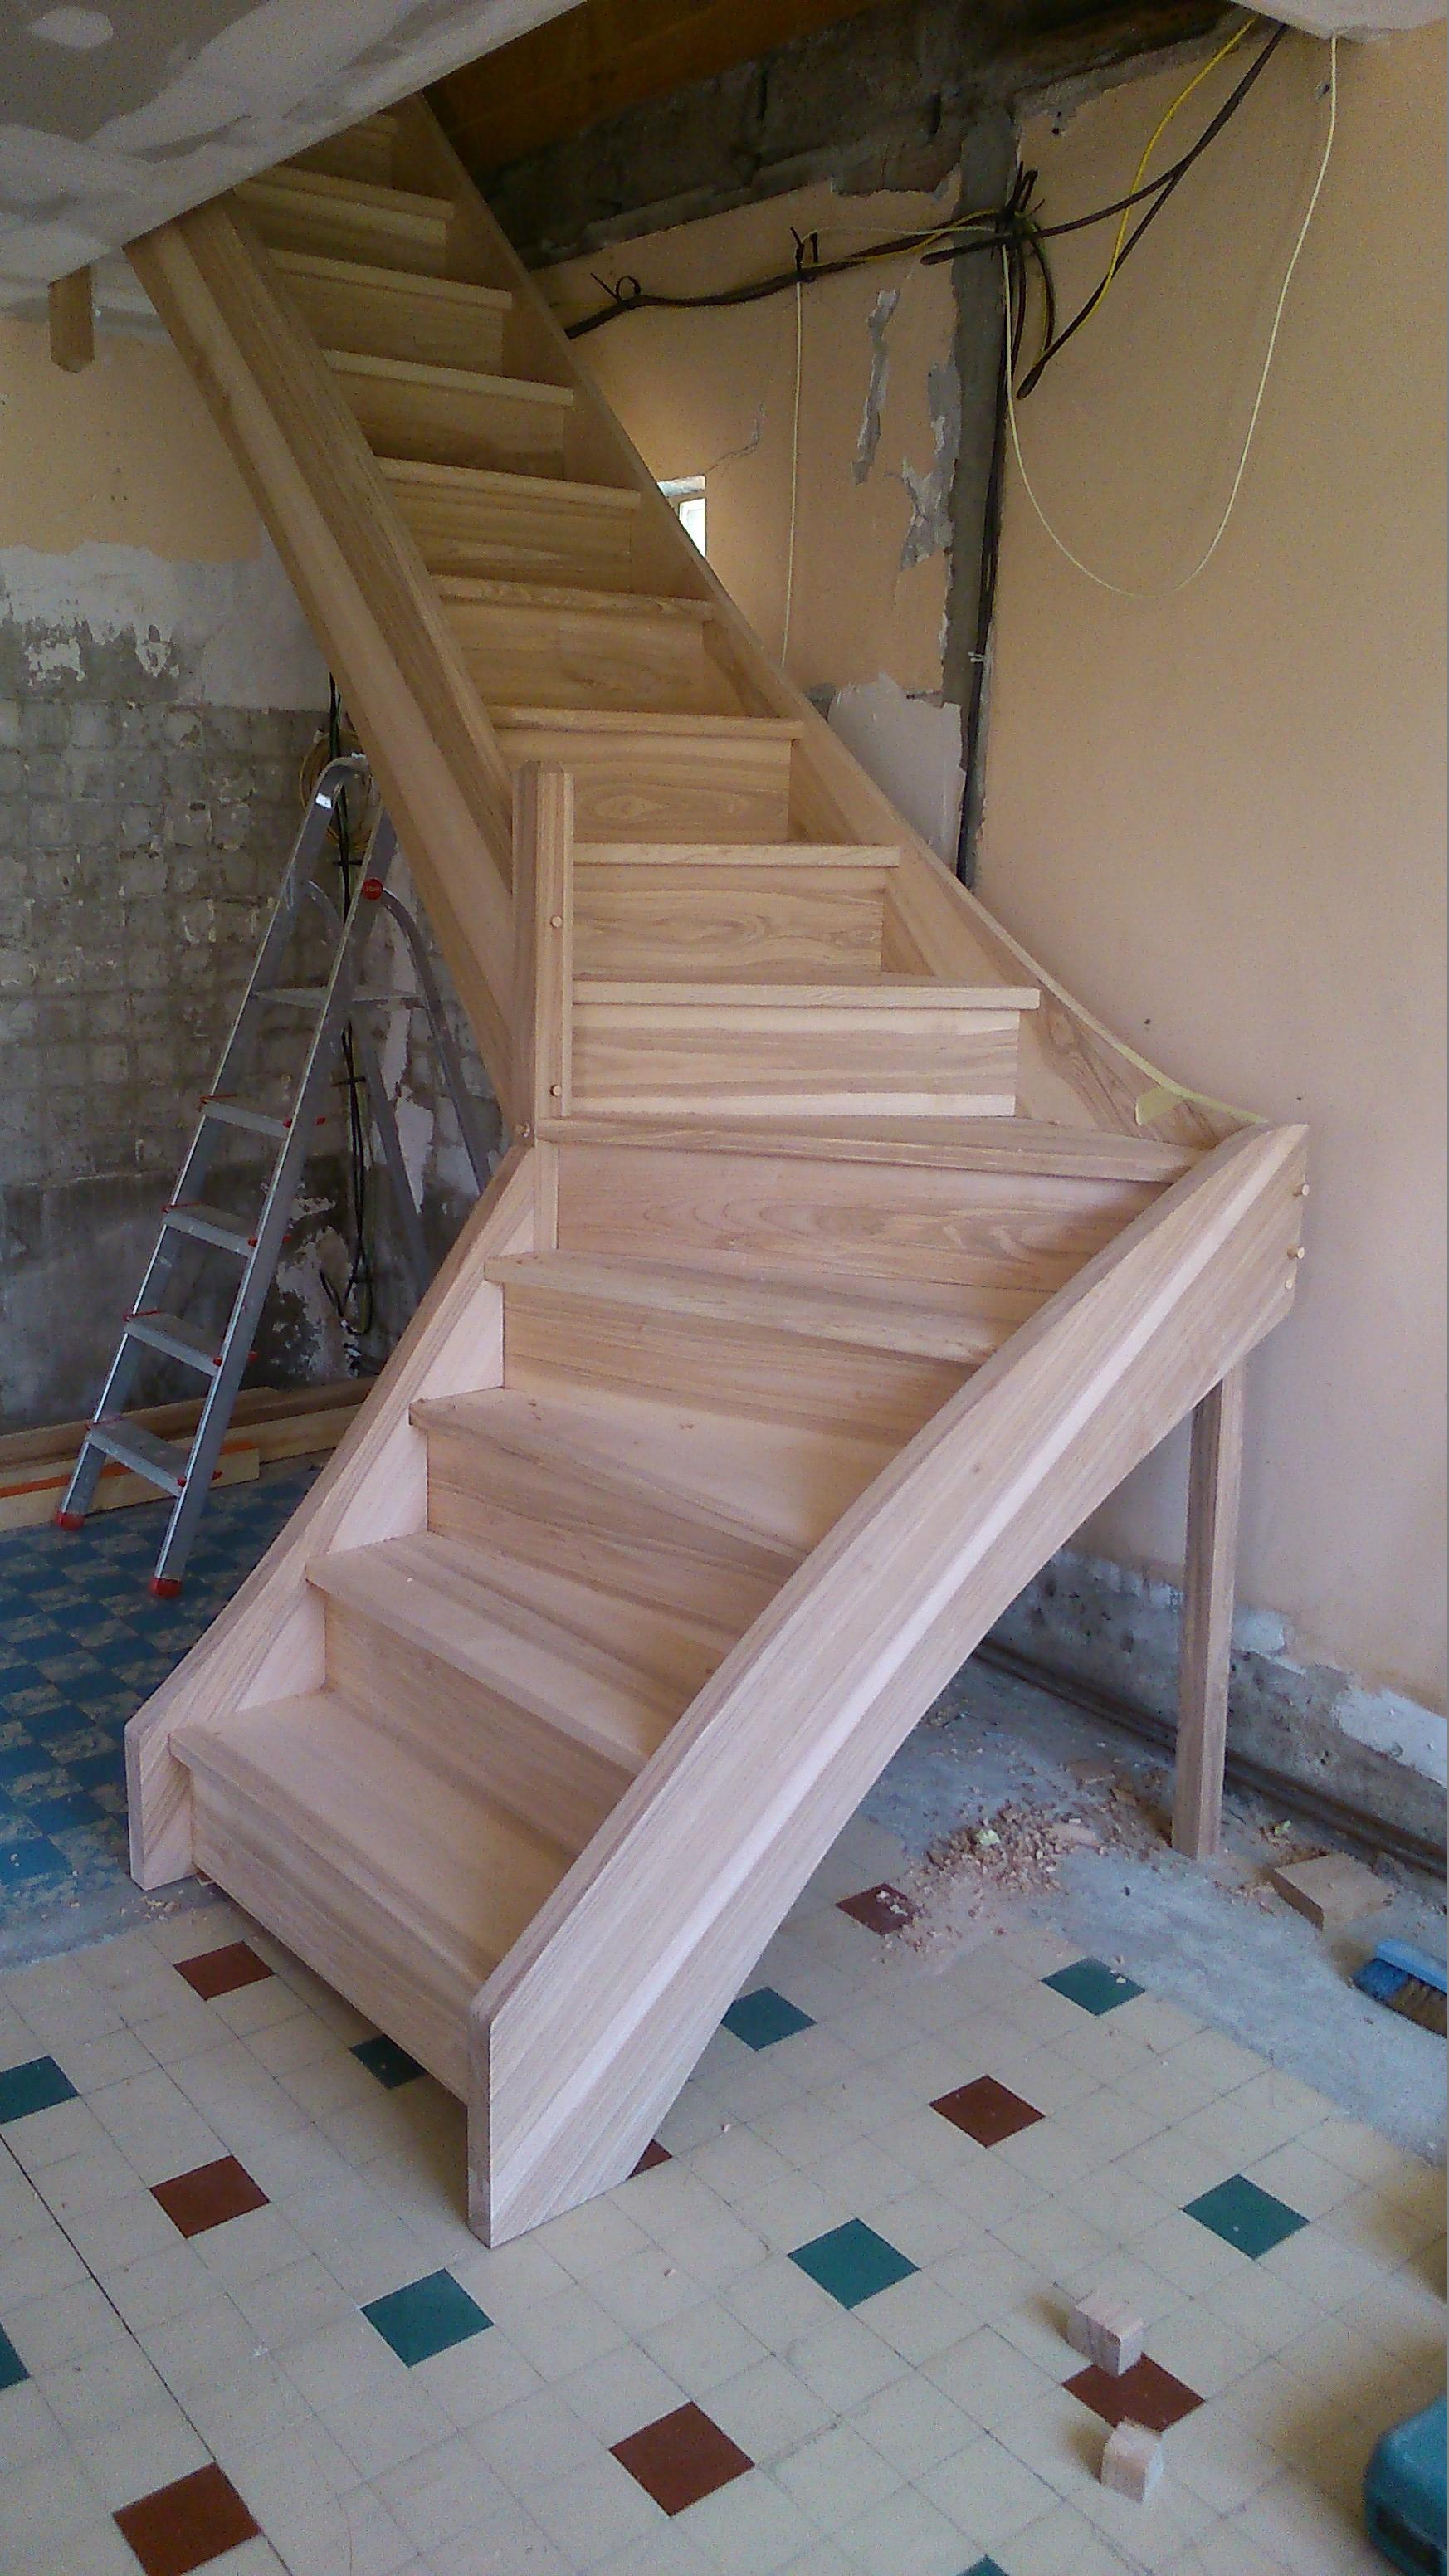 Escalier Quart tournant frêne massif fabrication artisanal sur mesure